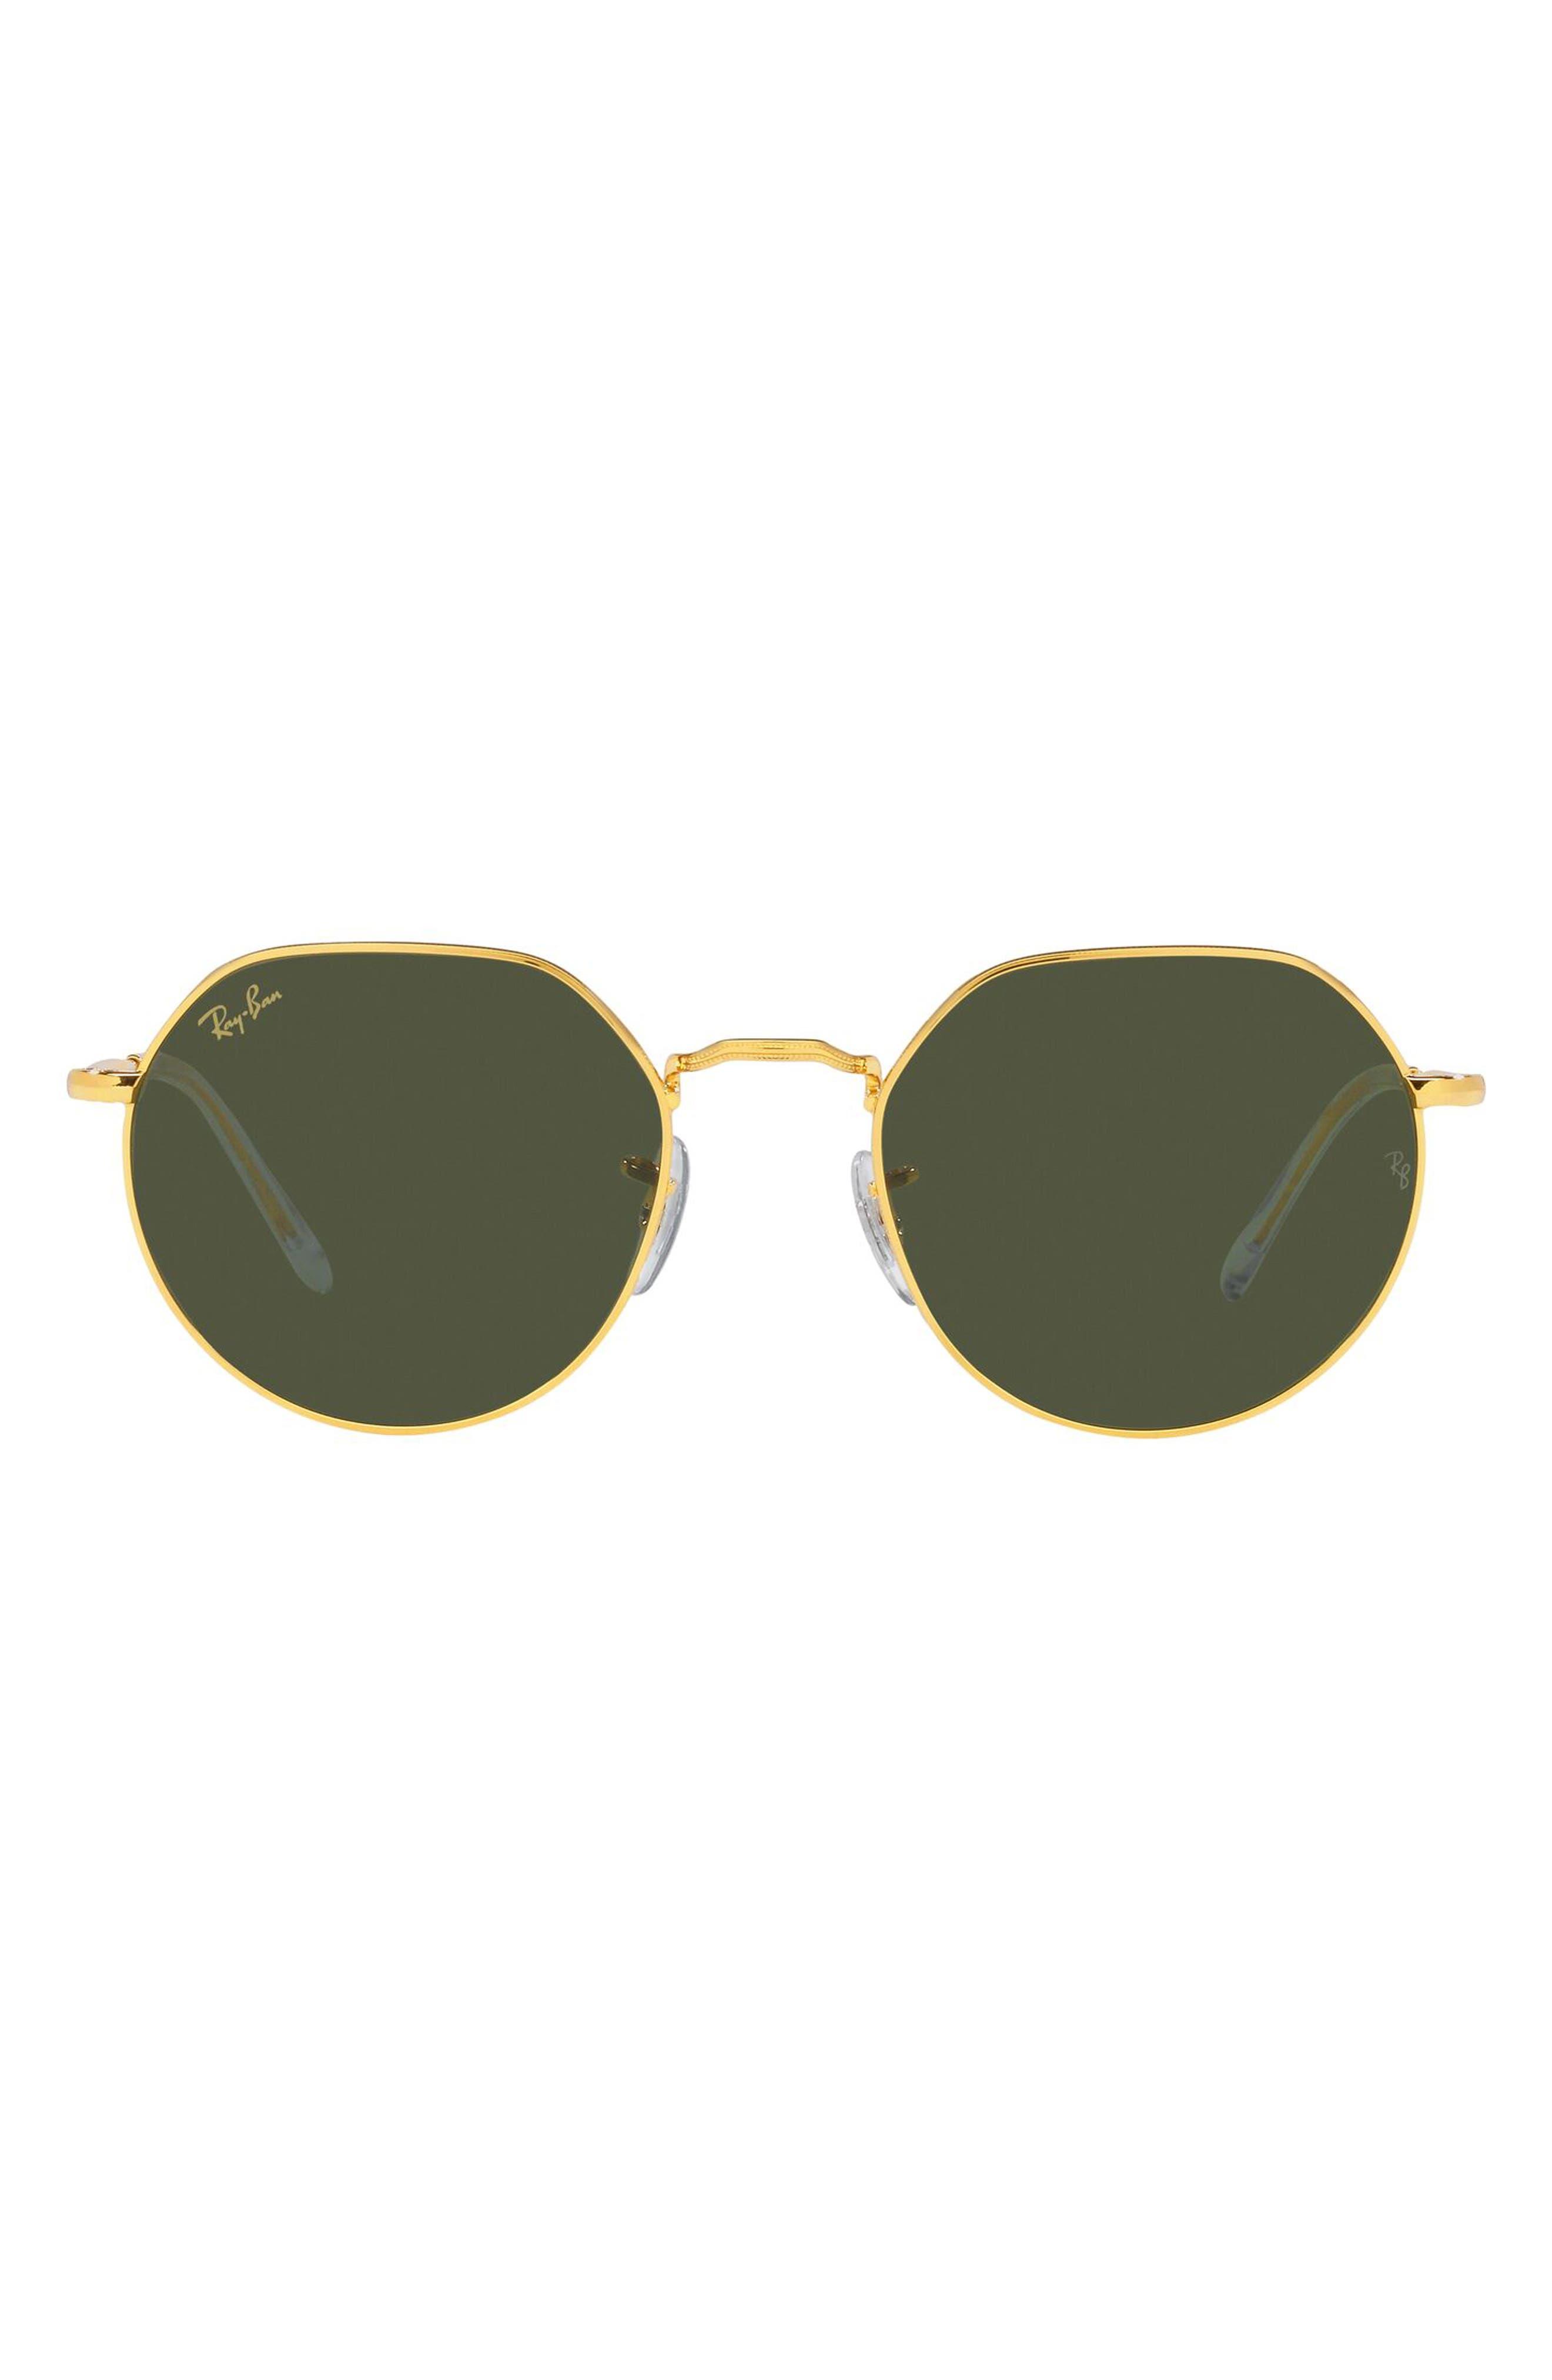 Women's Ray-Ban Jack 53mm Sunglasses - Legend Gold / Green